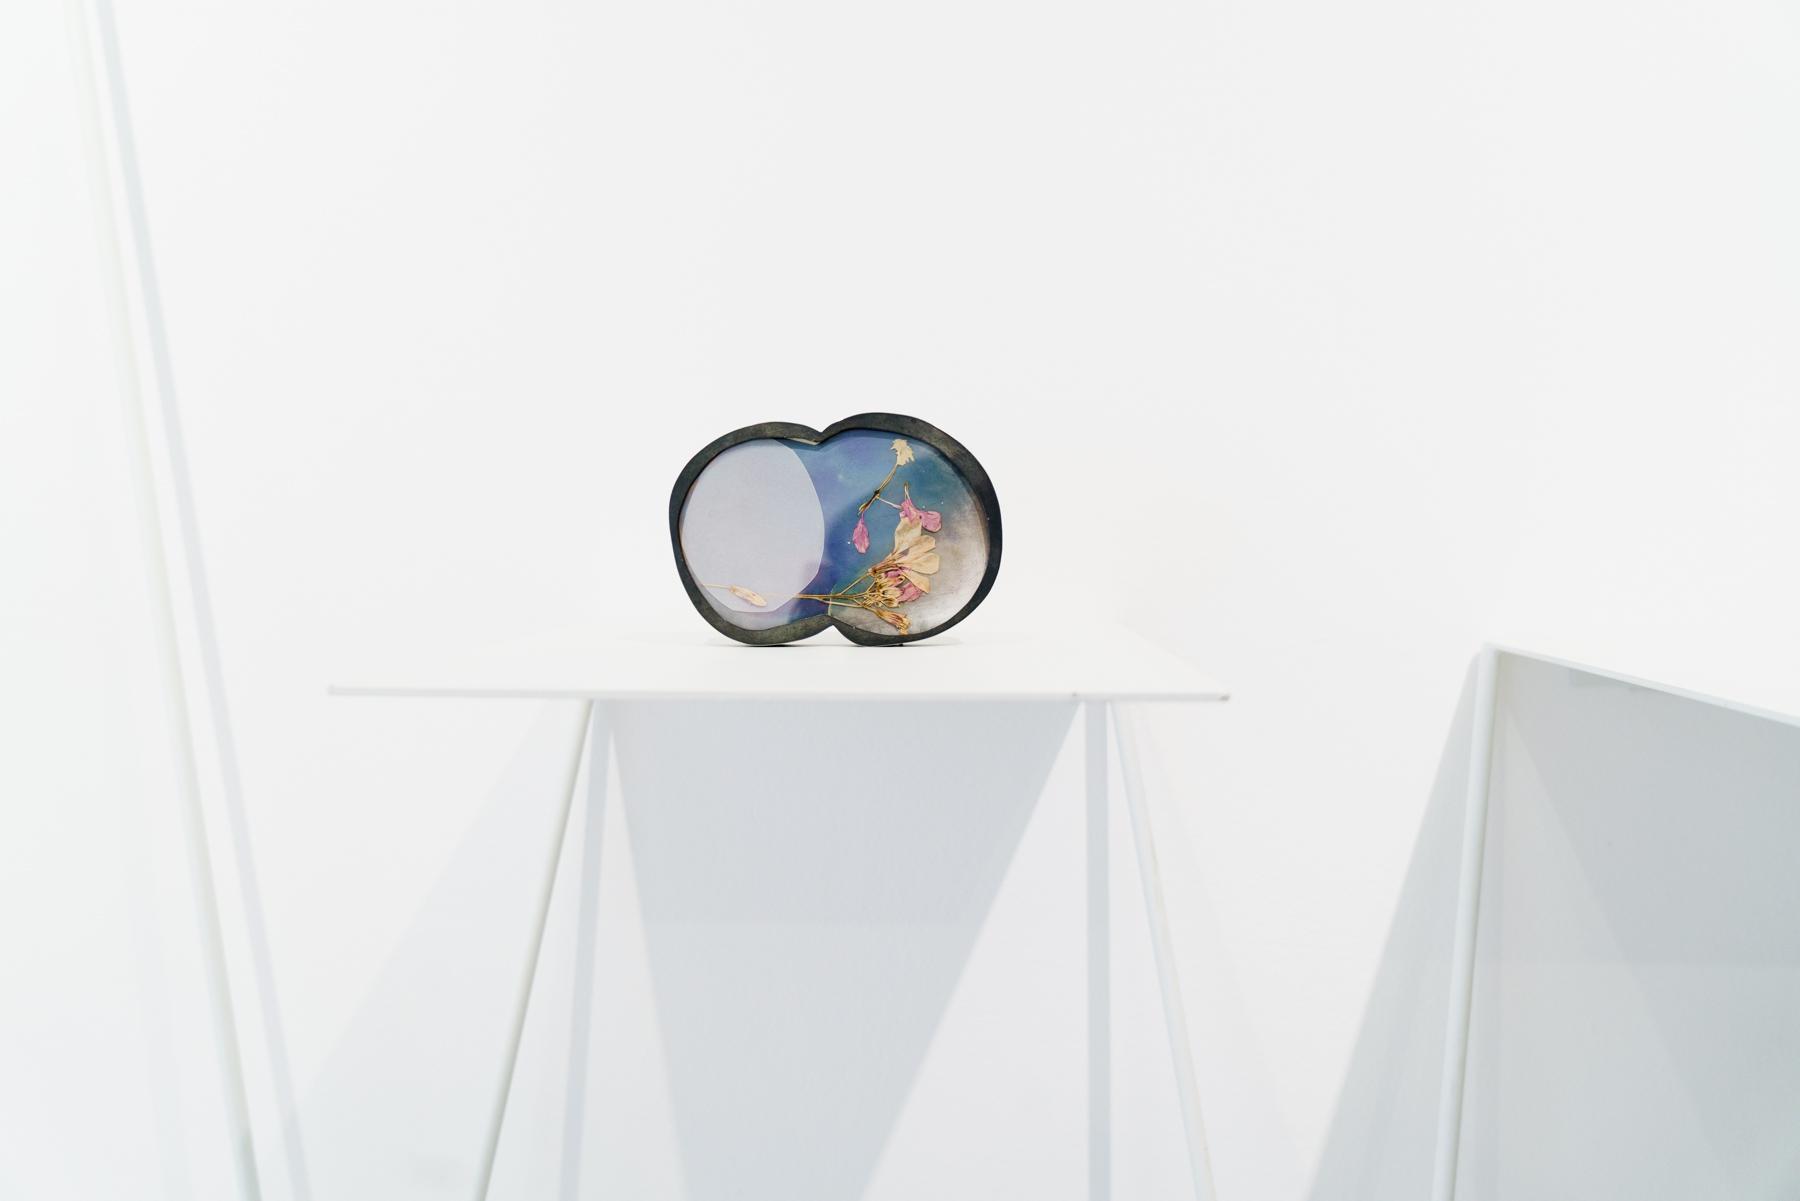 Exhibition view, Isabel Dammermann,  Treasuries&Transience , 2016, OHMYBLUE, Venice, Italy - photo: Riccardo Banfi